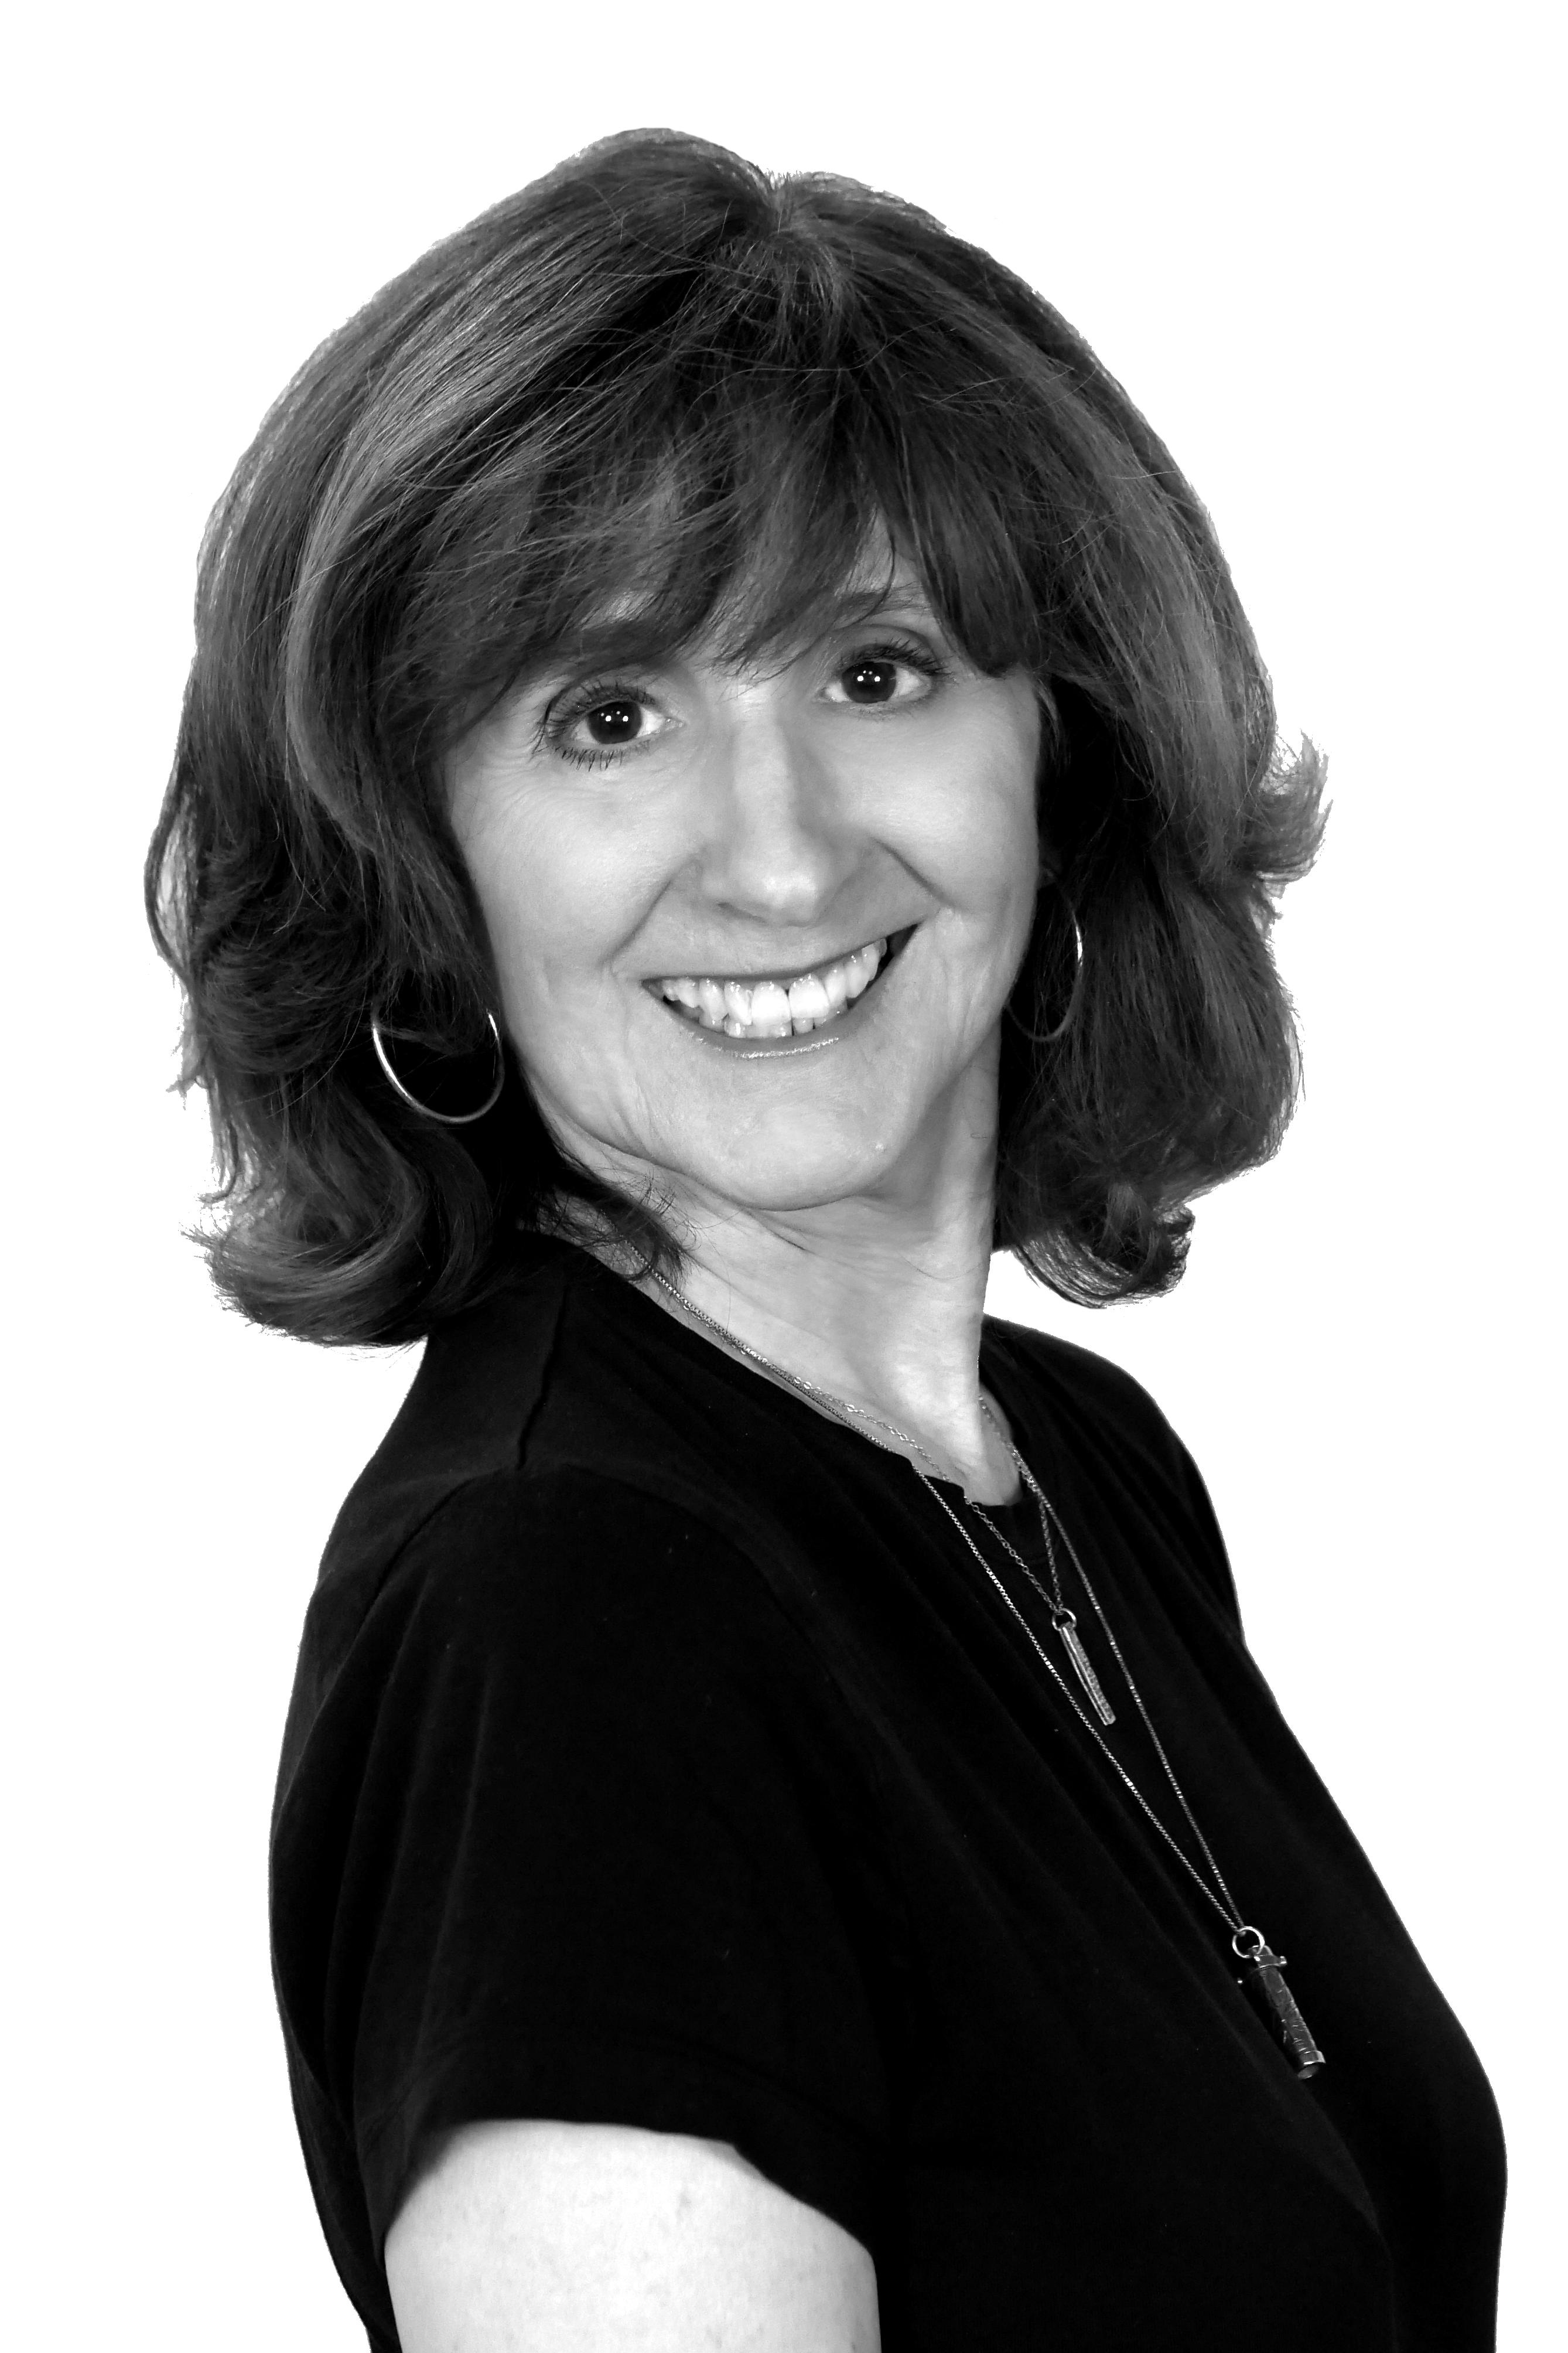 Natalie Rosenthal